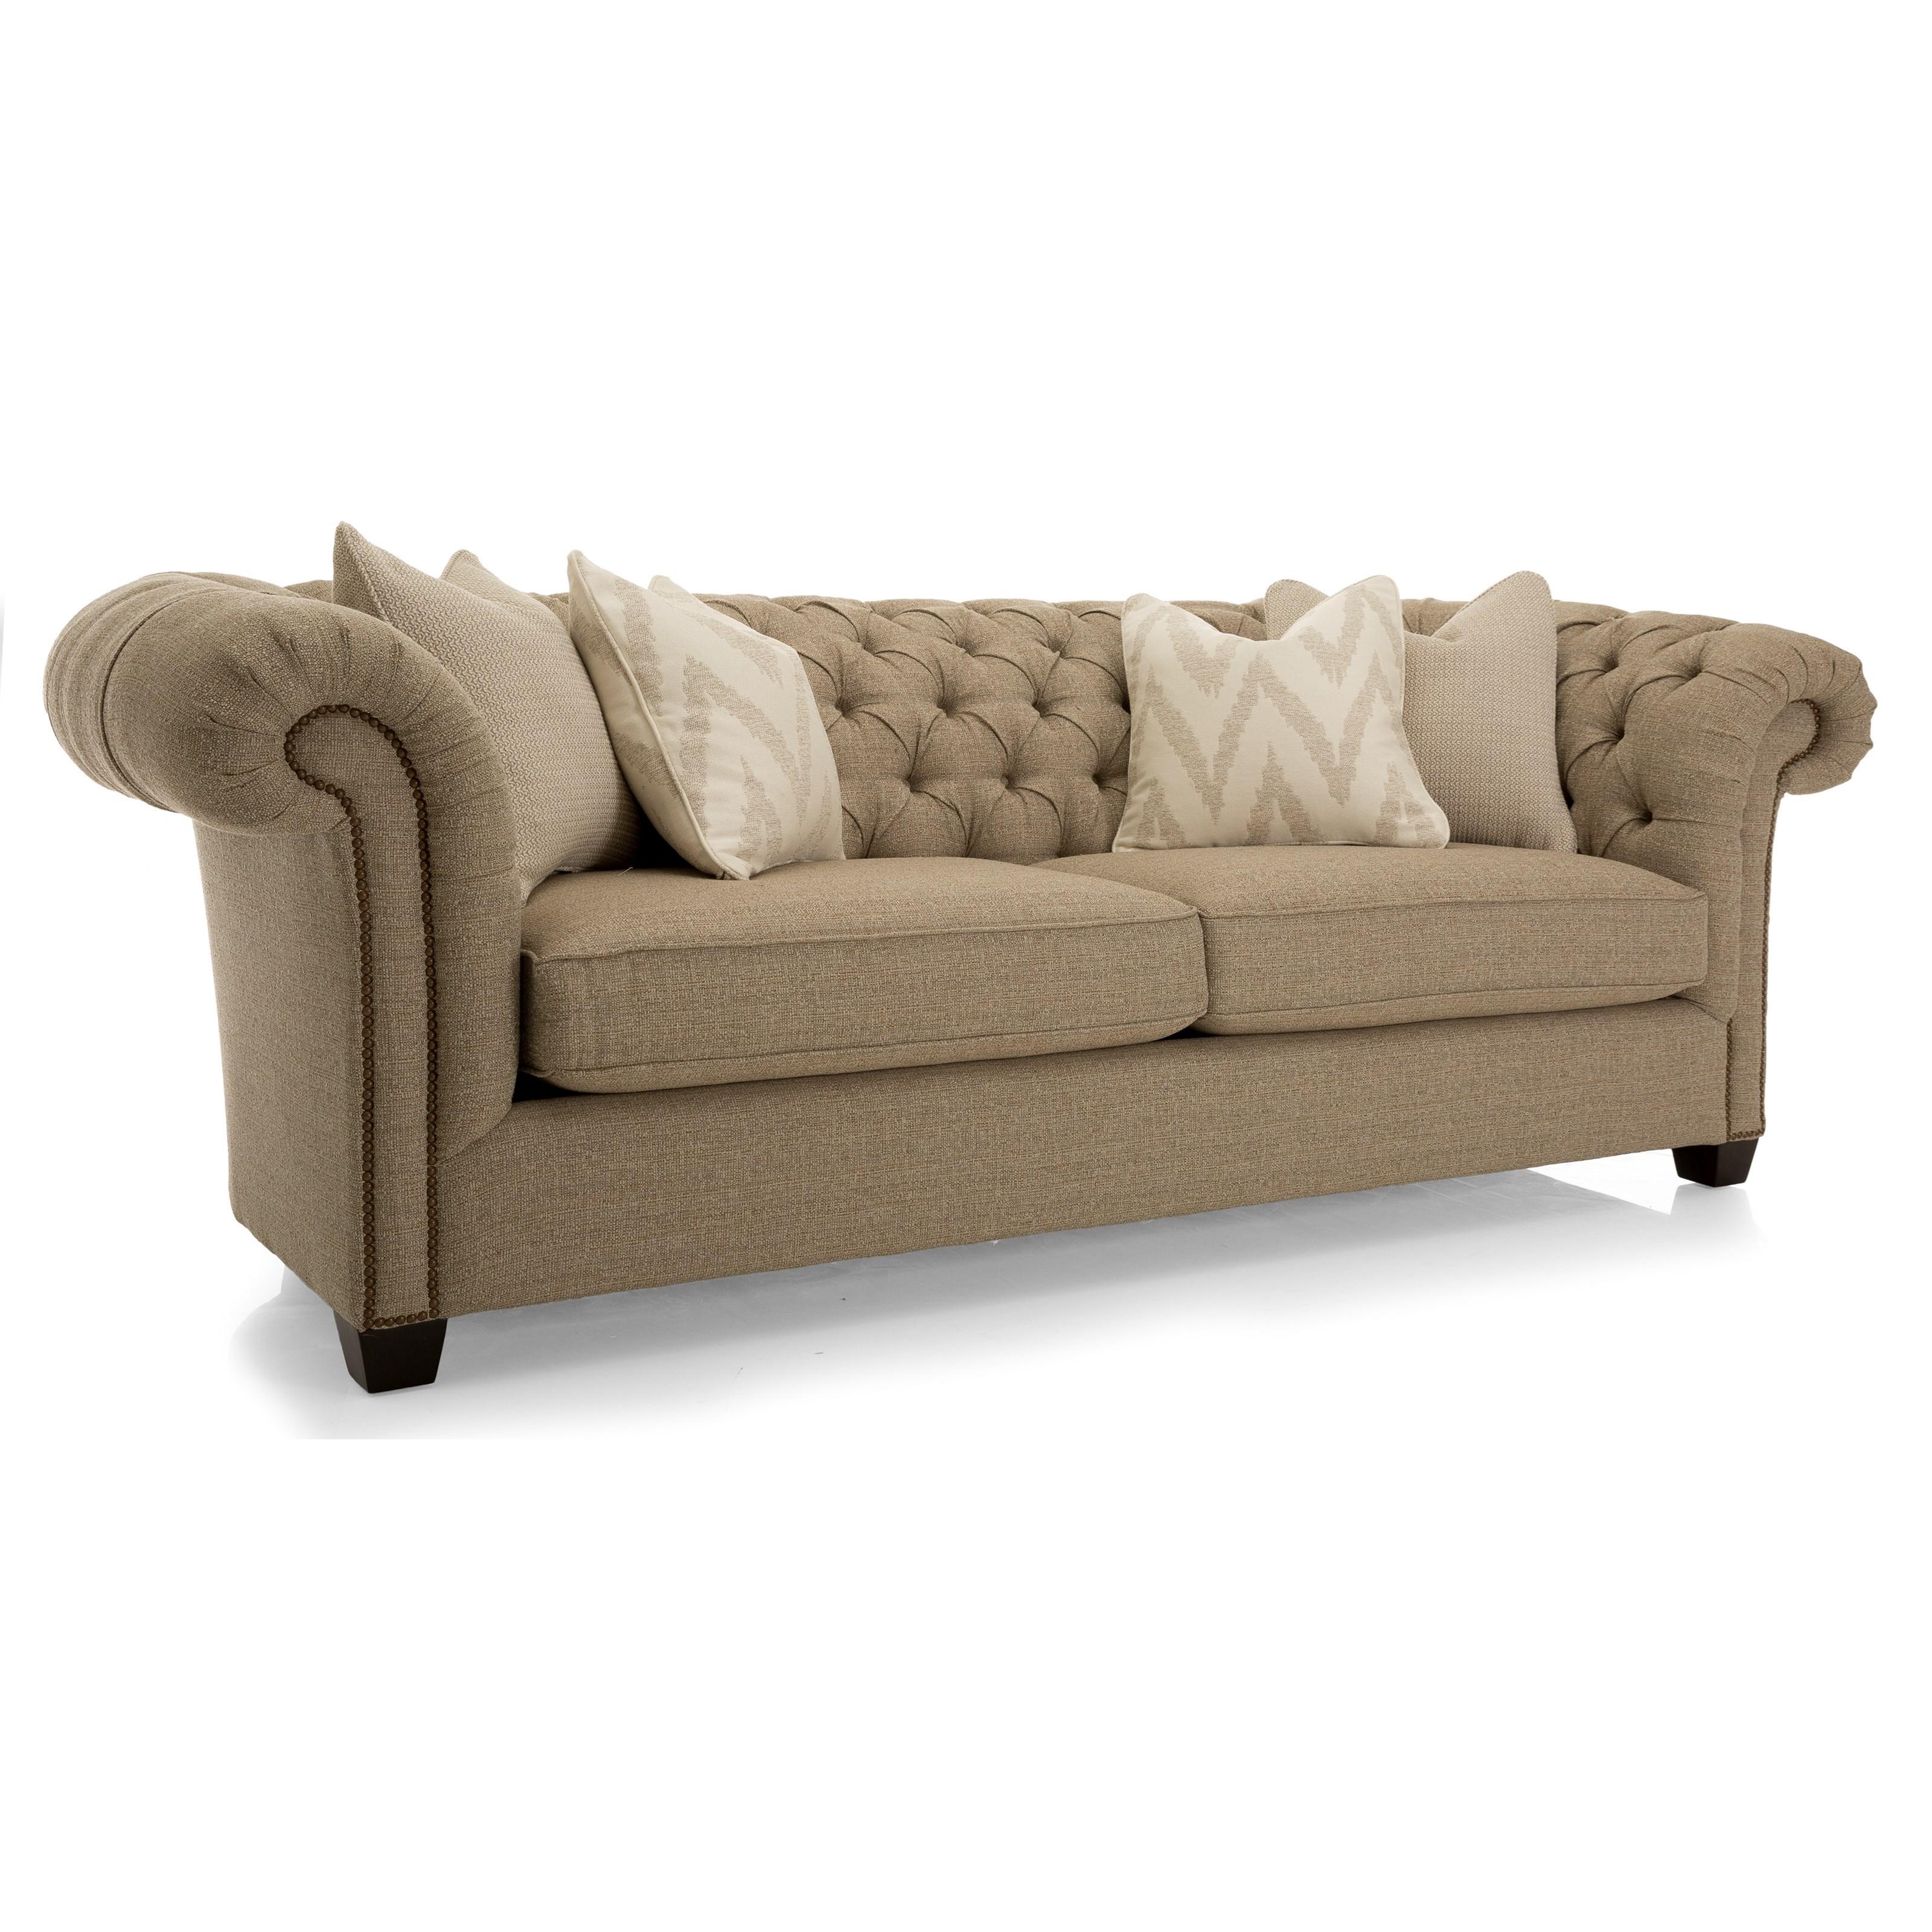 Churchill Sofa by Decor-Rest at Stoney Creek Furniture